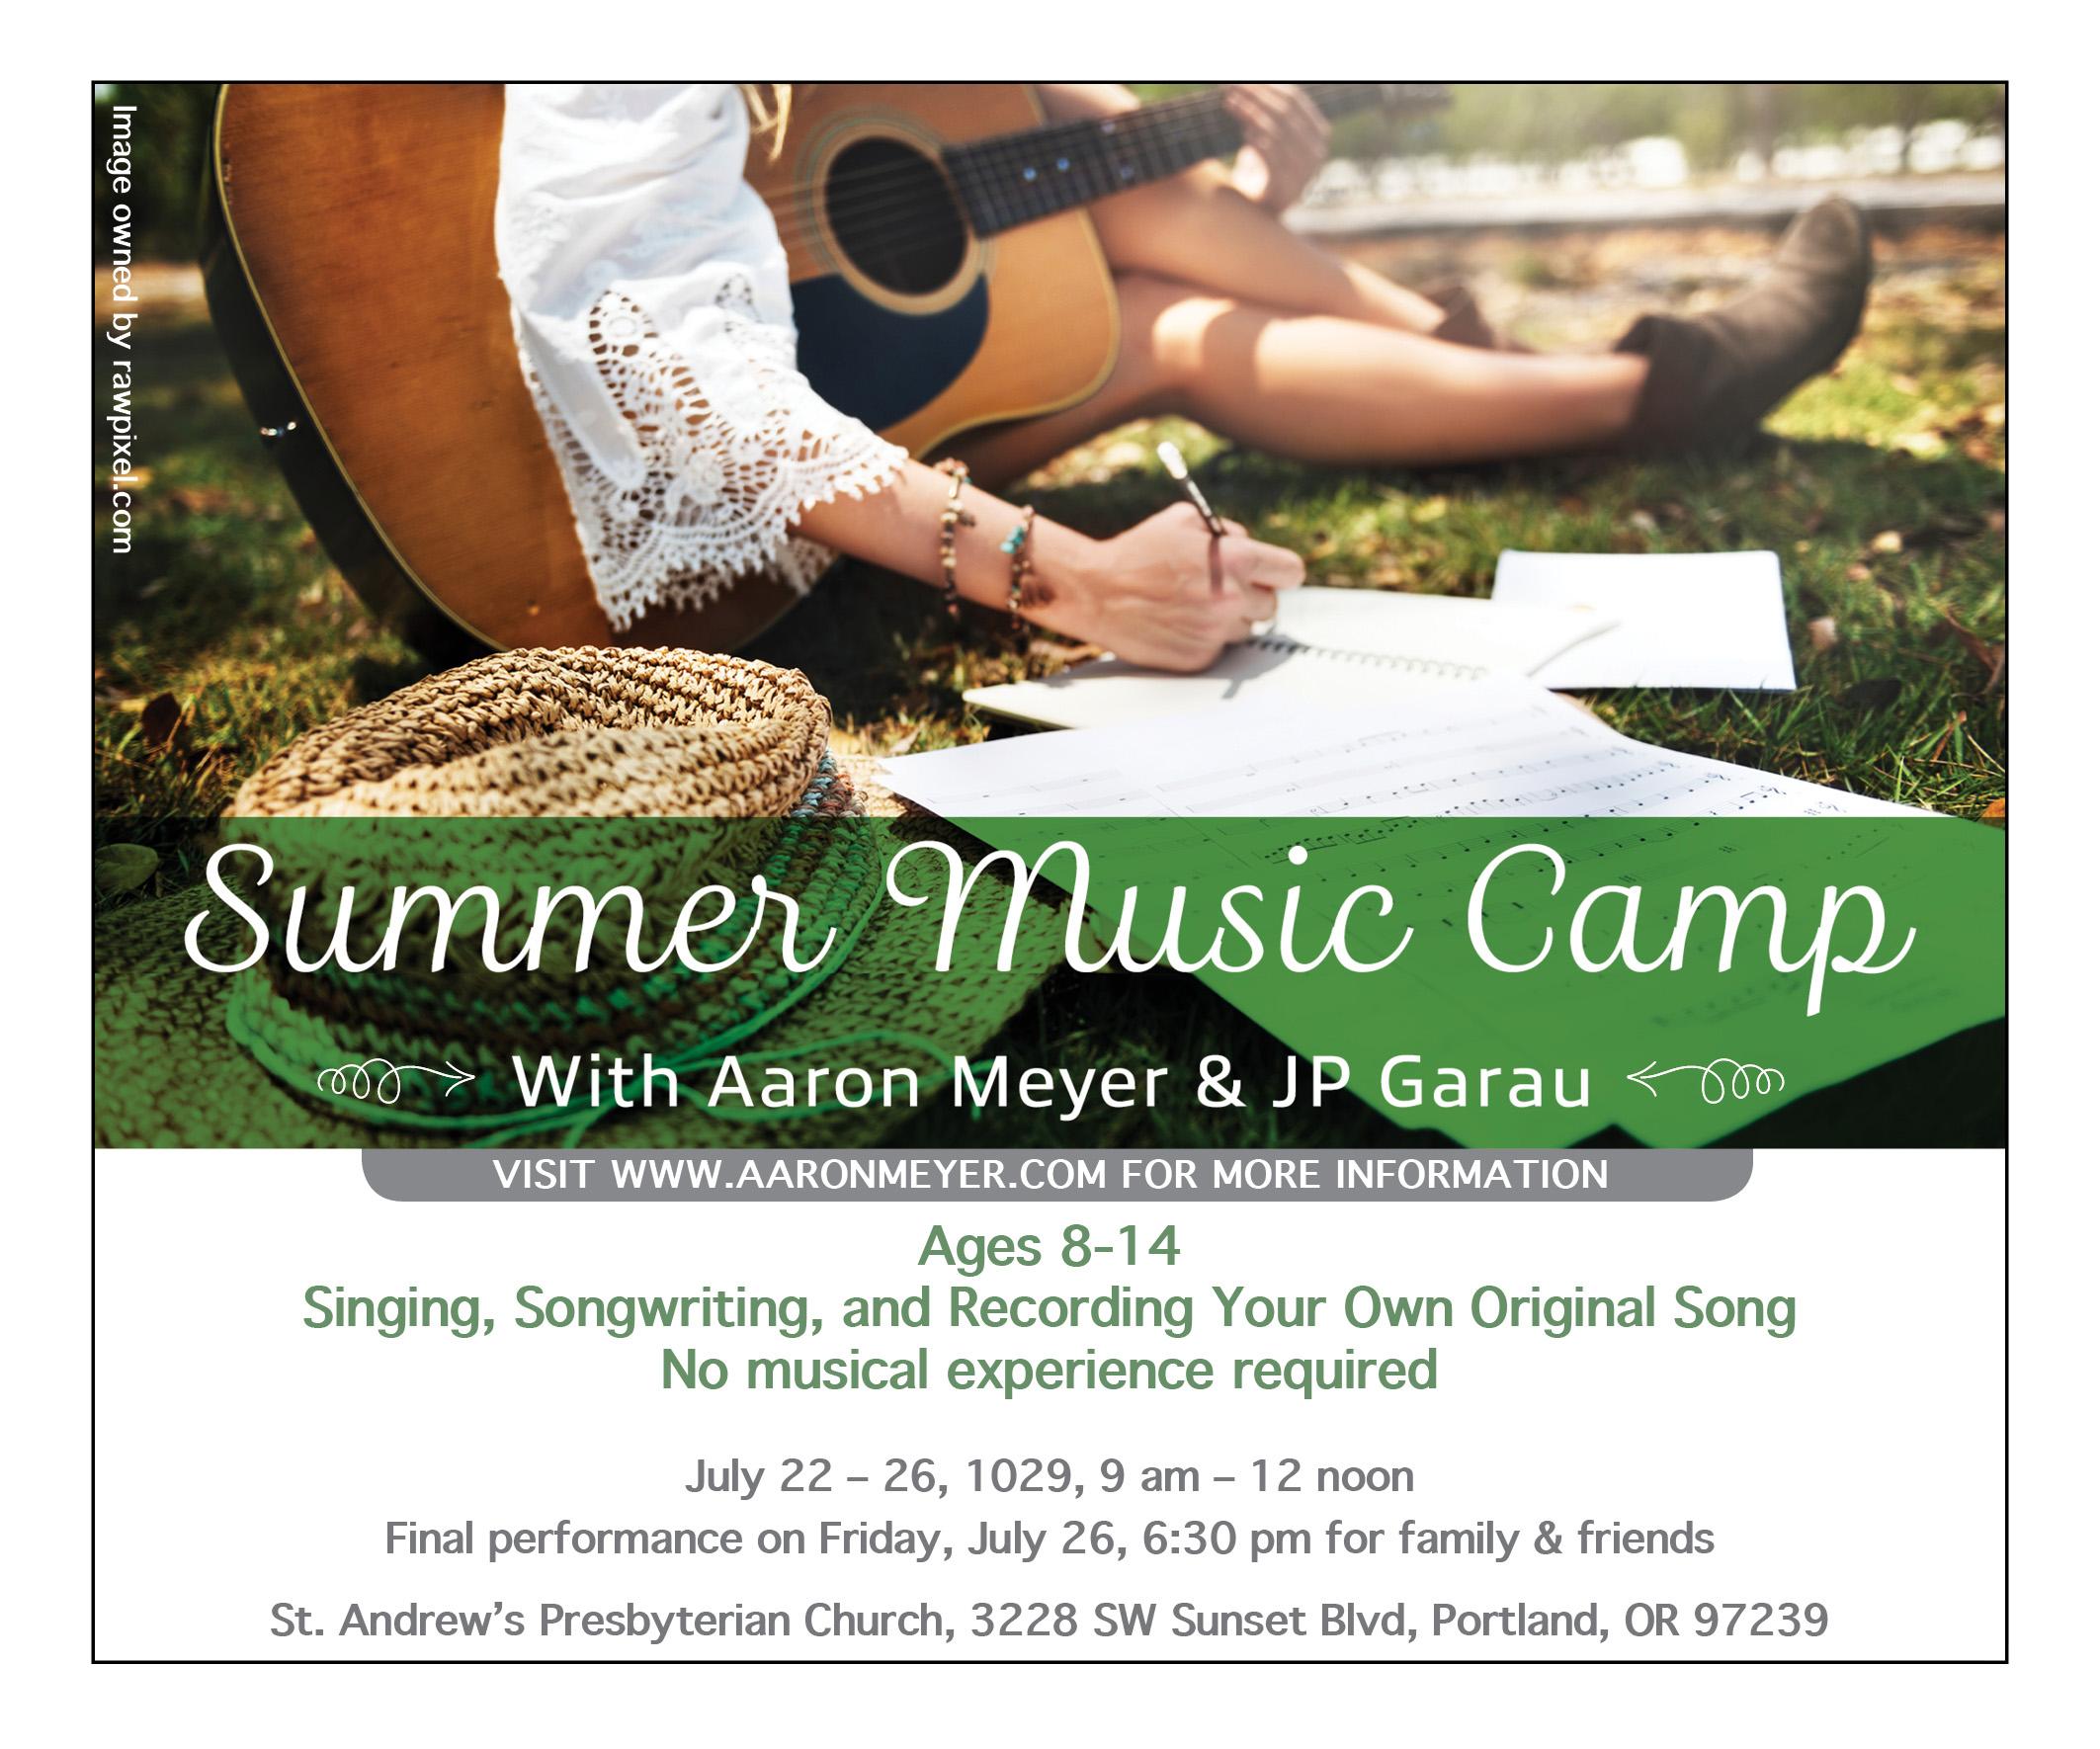 SummerMusicSM_r2.jpg